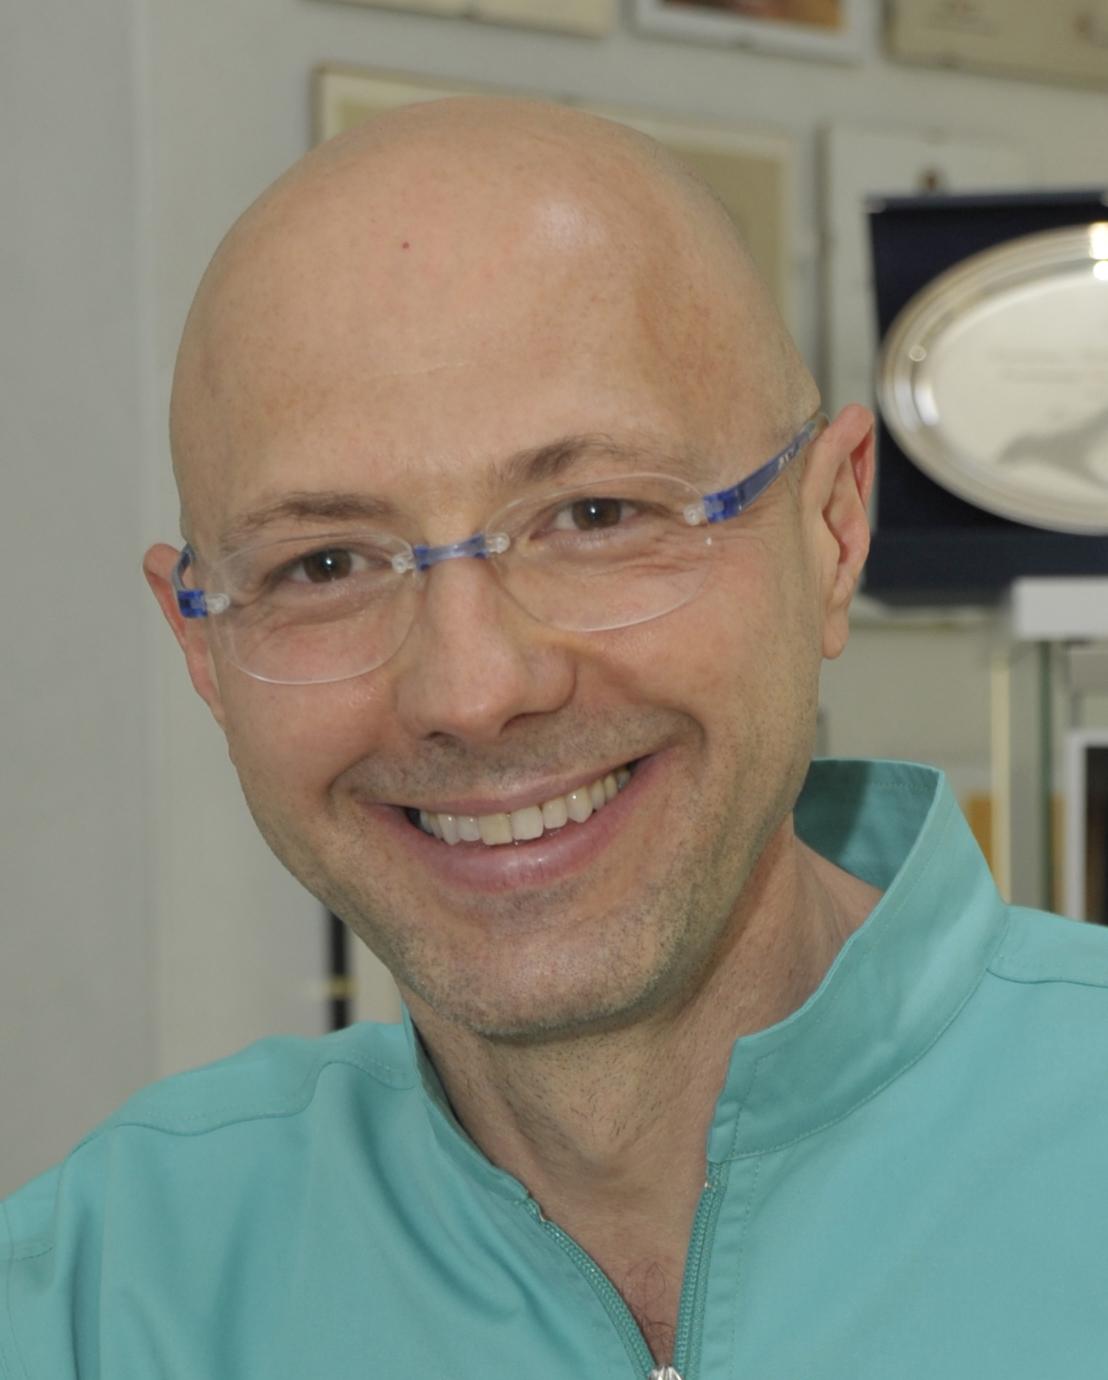 DR MARCO VENEZIANI